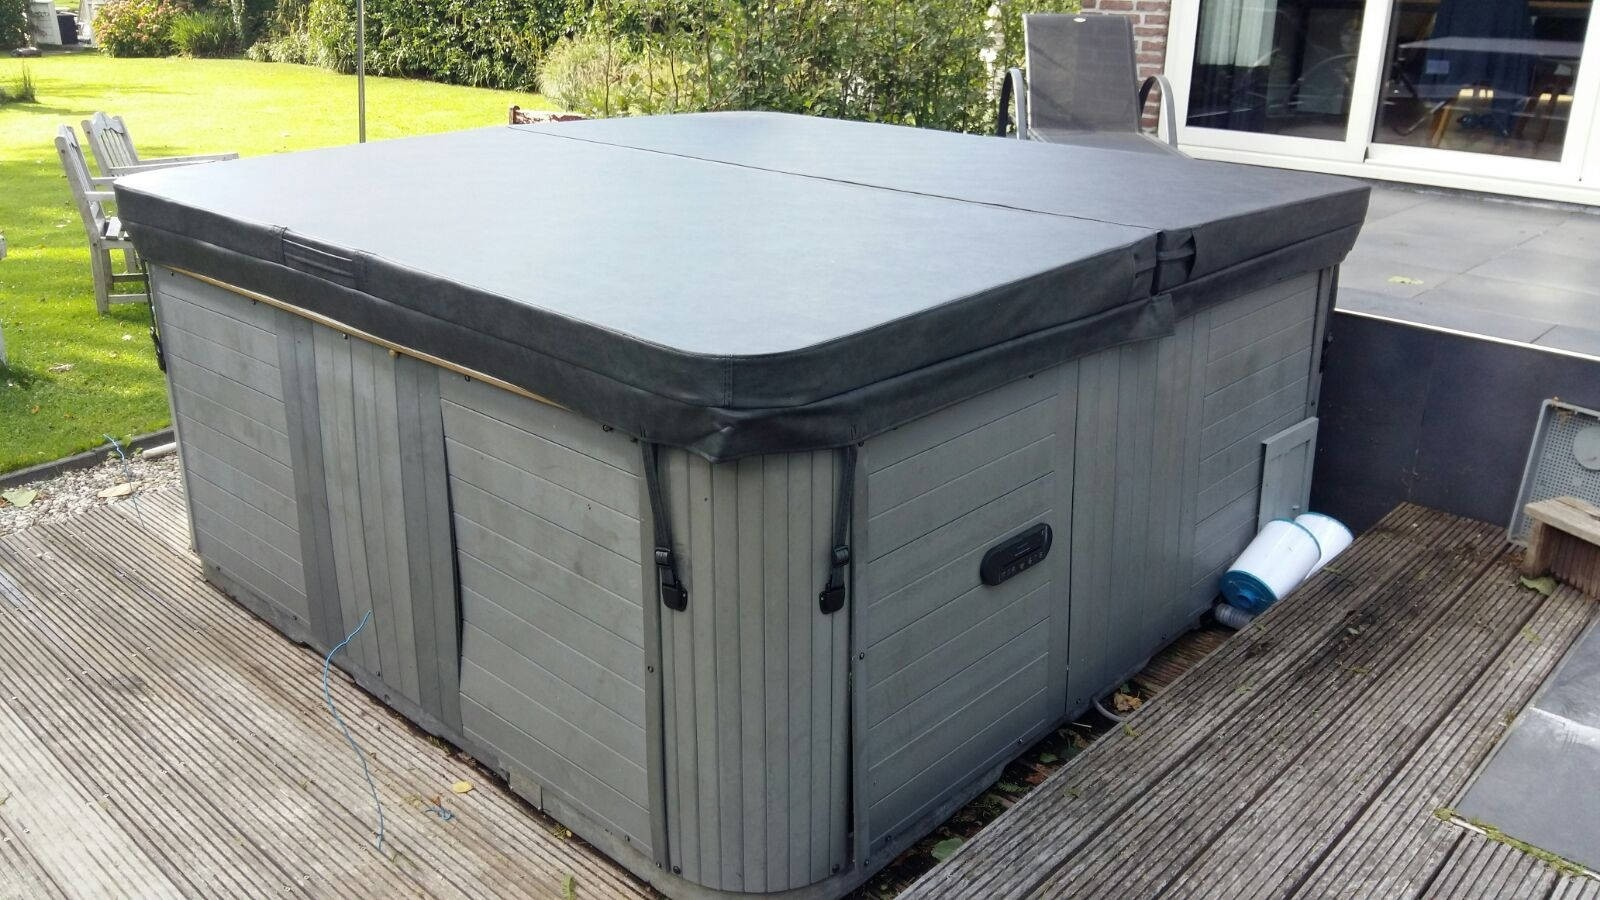 Vervanging nieuwe spa cover op een spa in Giessenburg